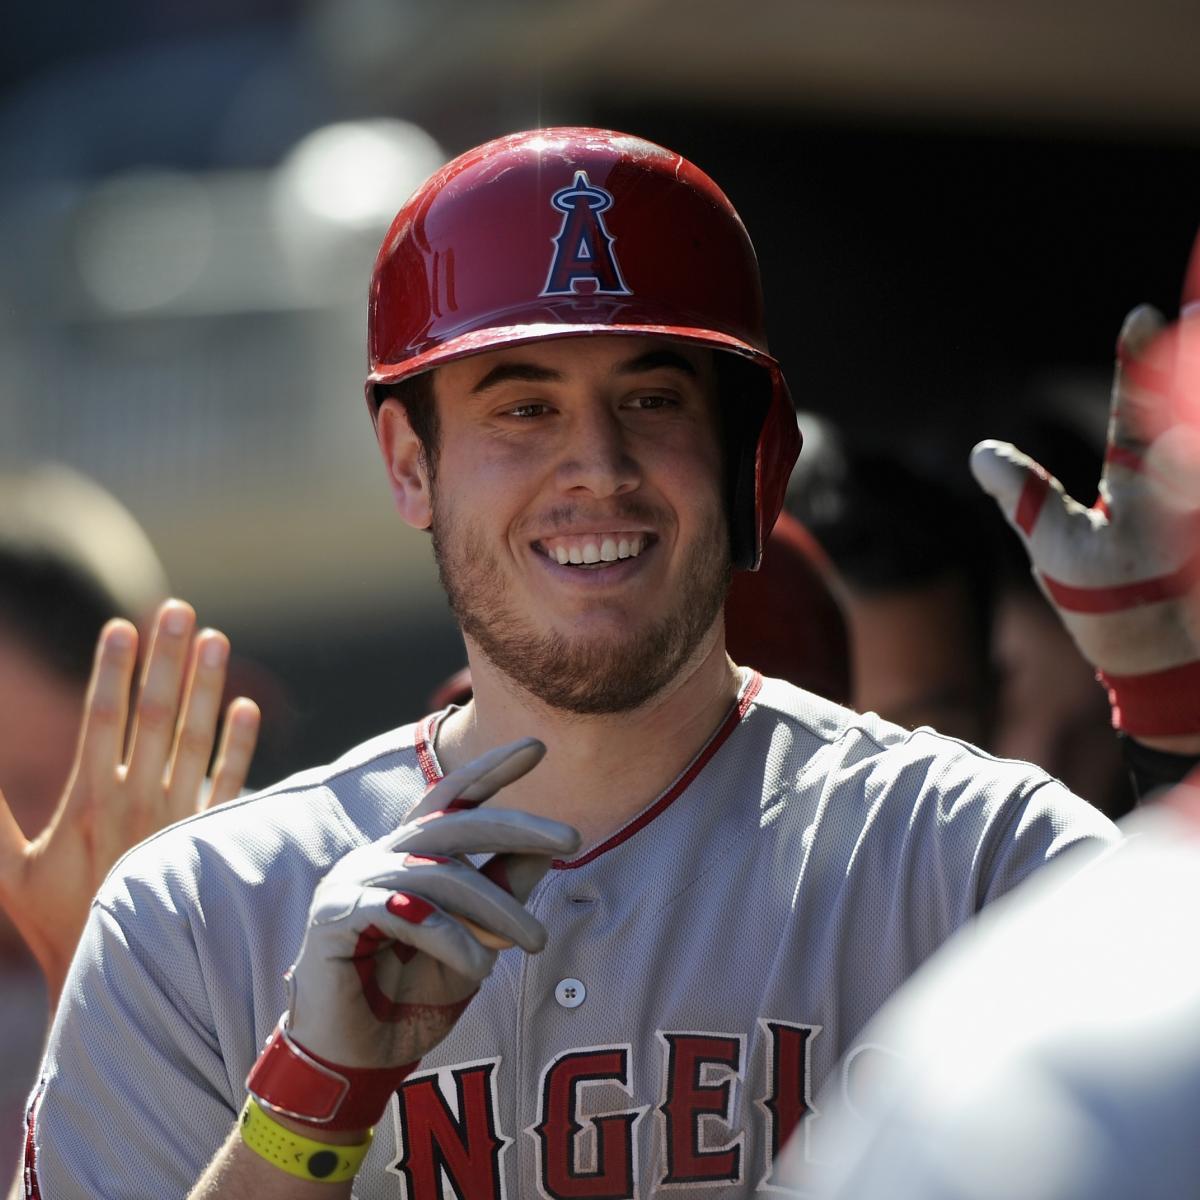 MLB Rookies Who Will Play Huge Roles In 2014 Postseason